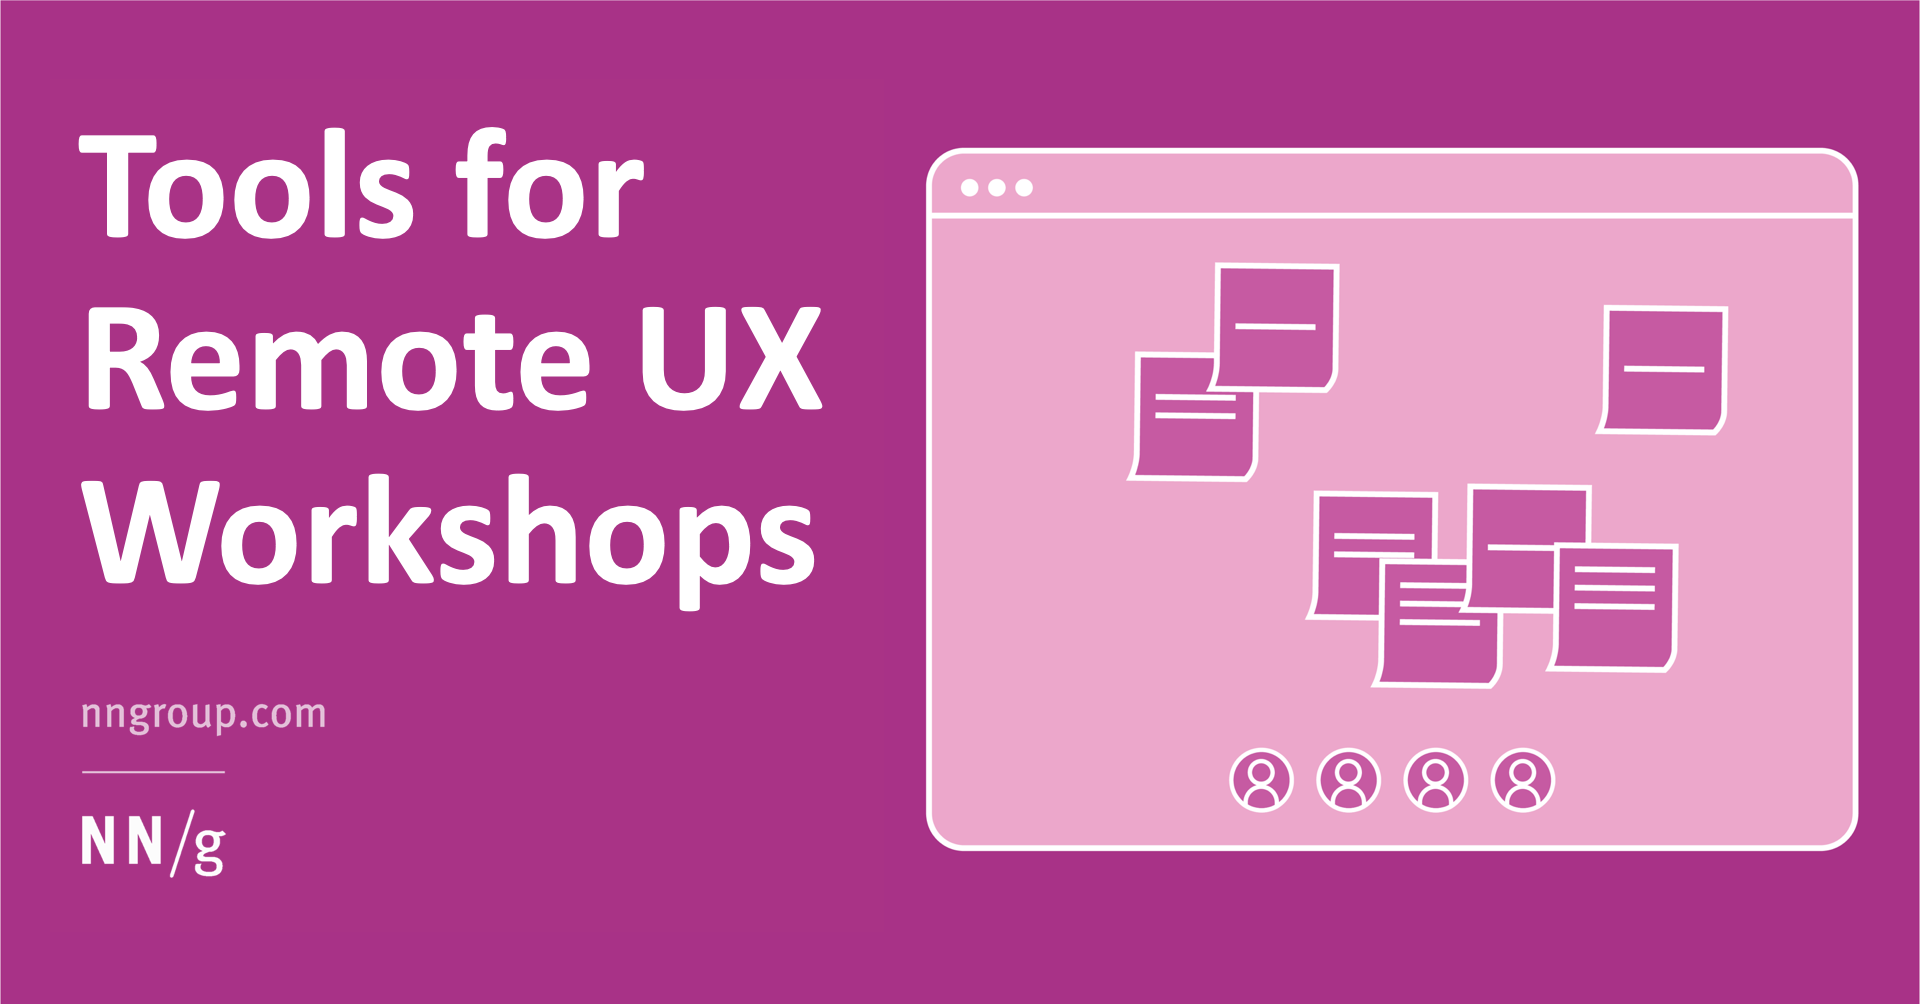 Tools for Remote UX Workshops